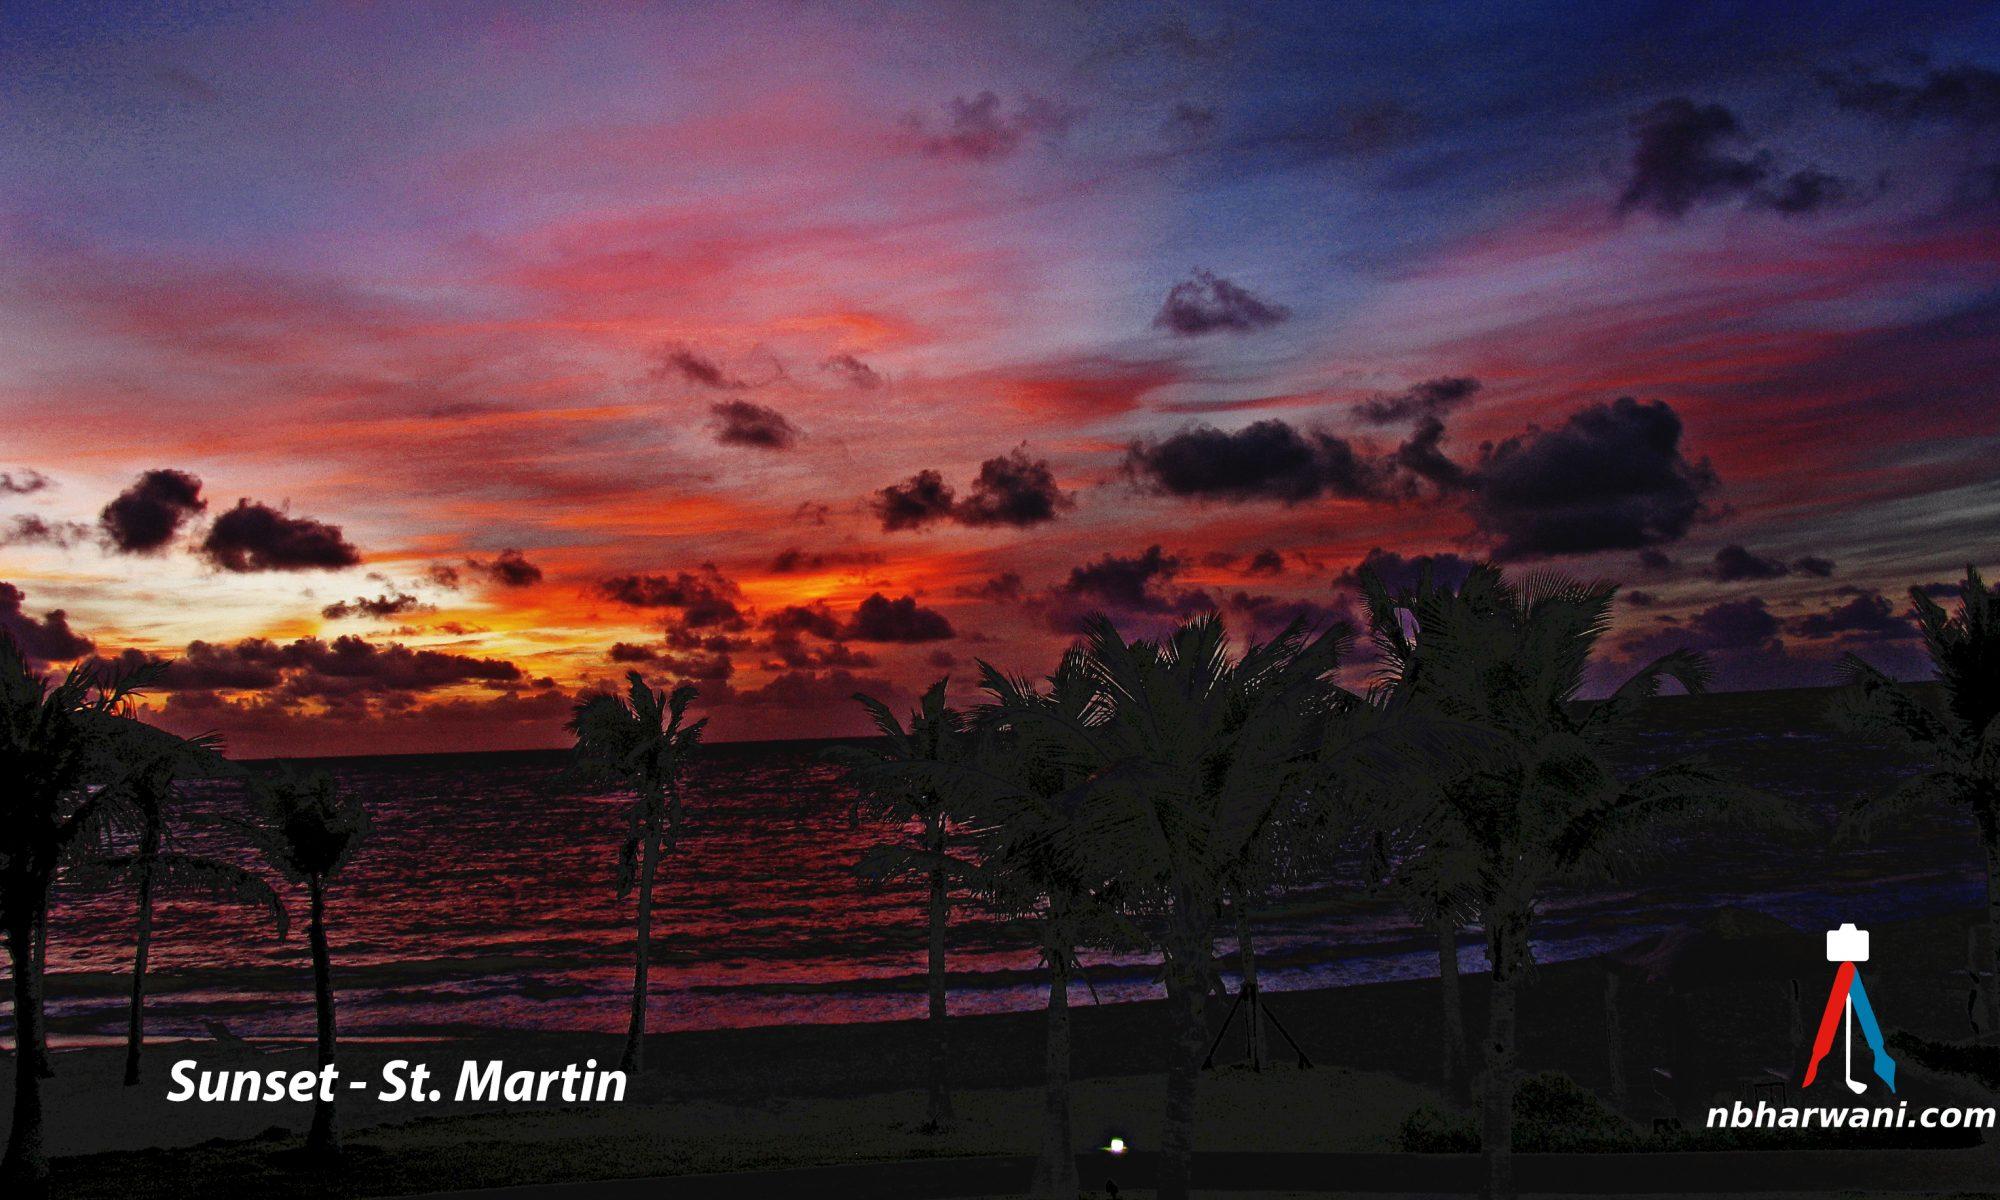 Sunset in Saint Martin, Caribbean. (Dr. Noorali Bharwani)